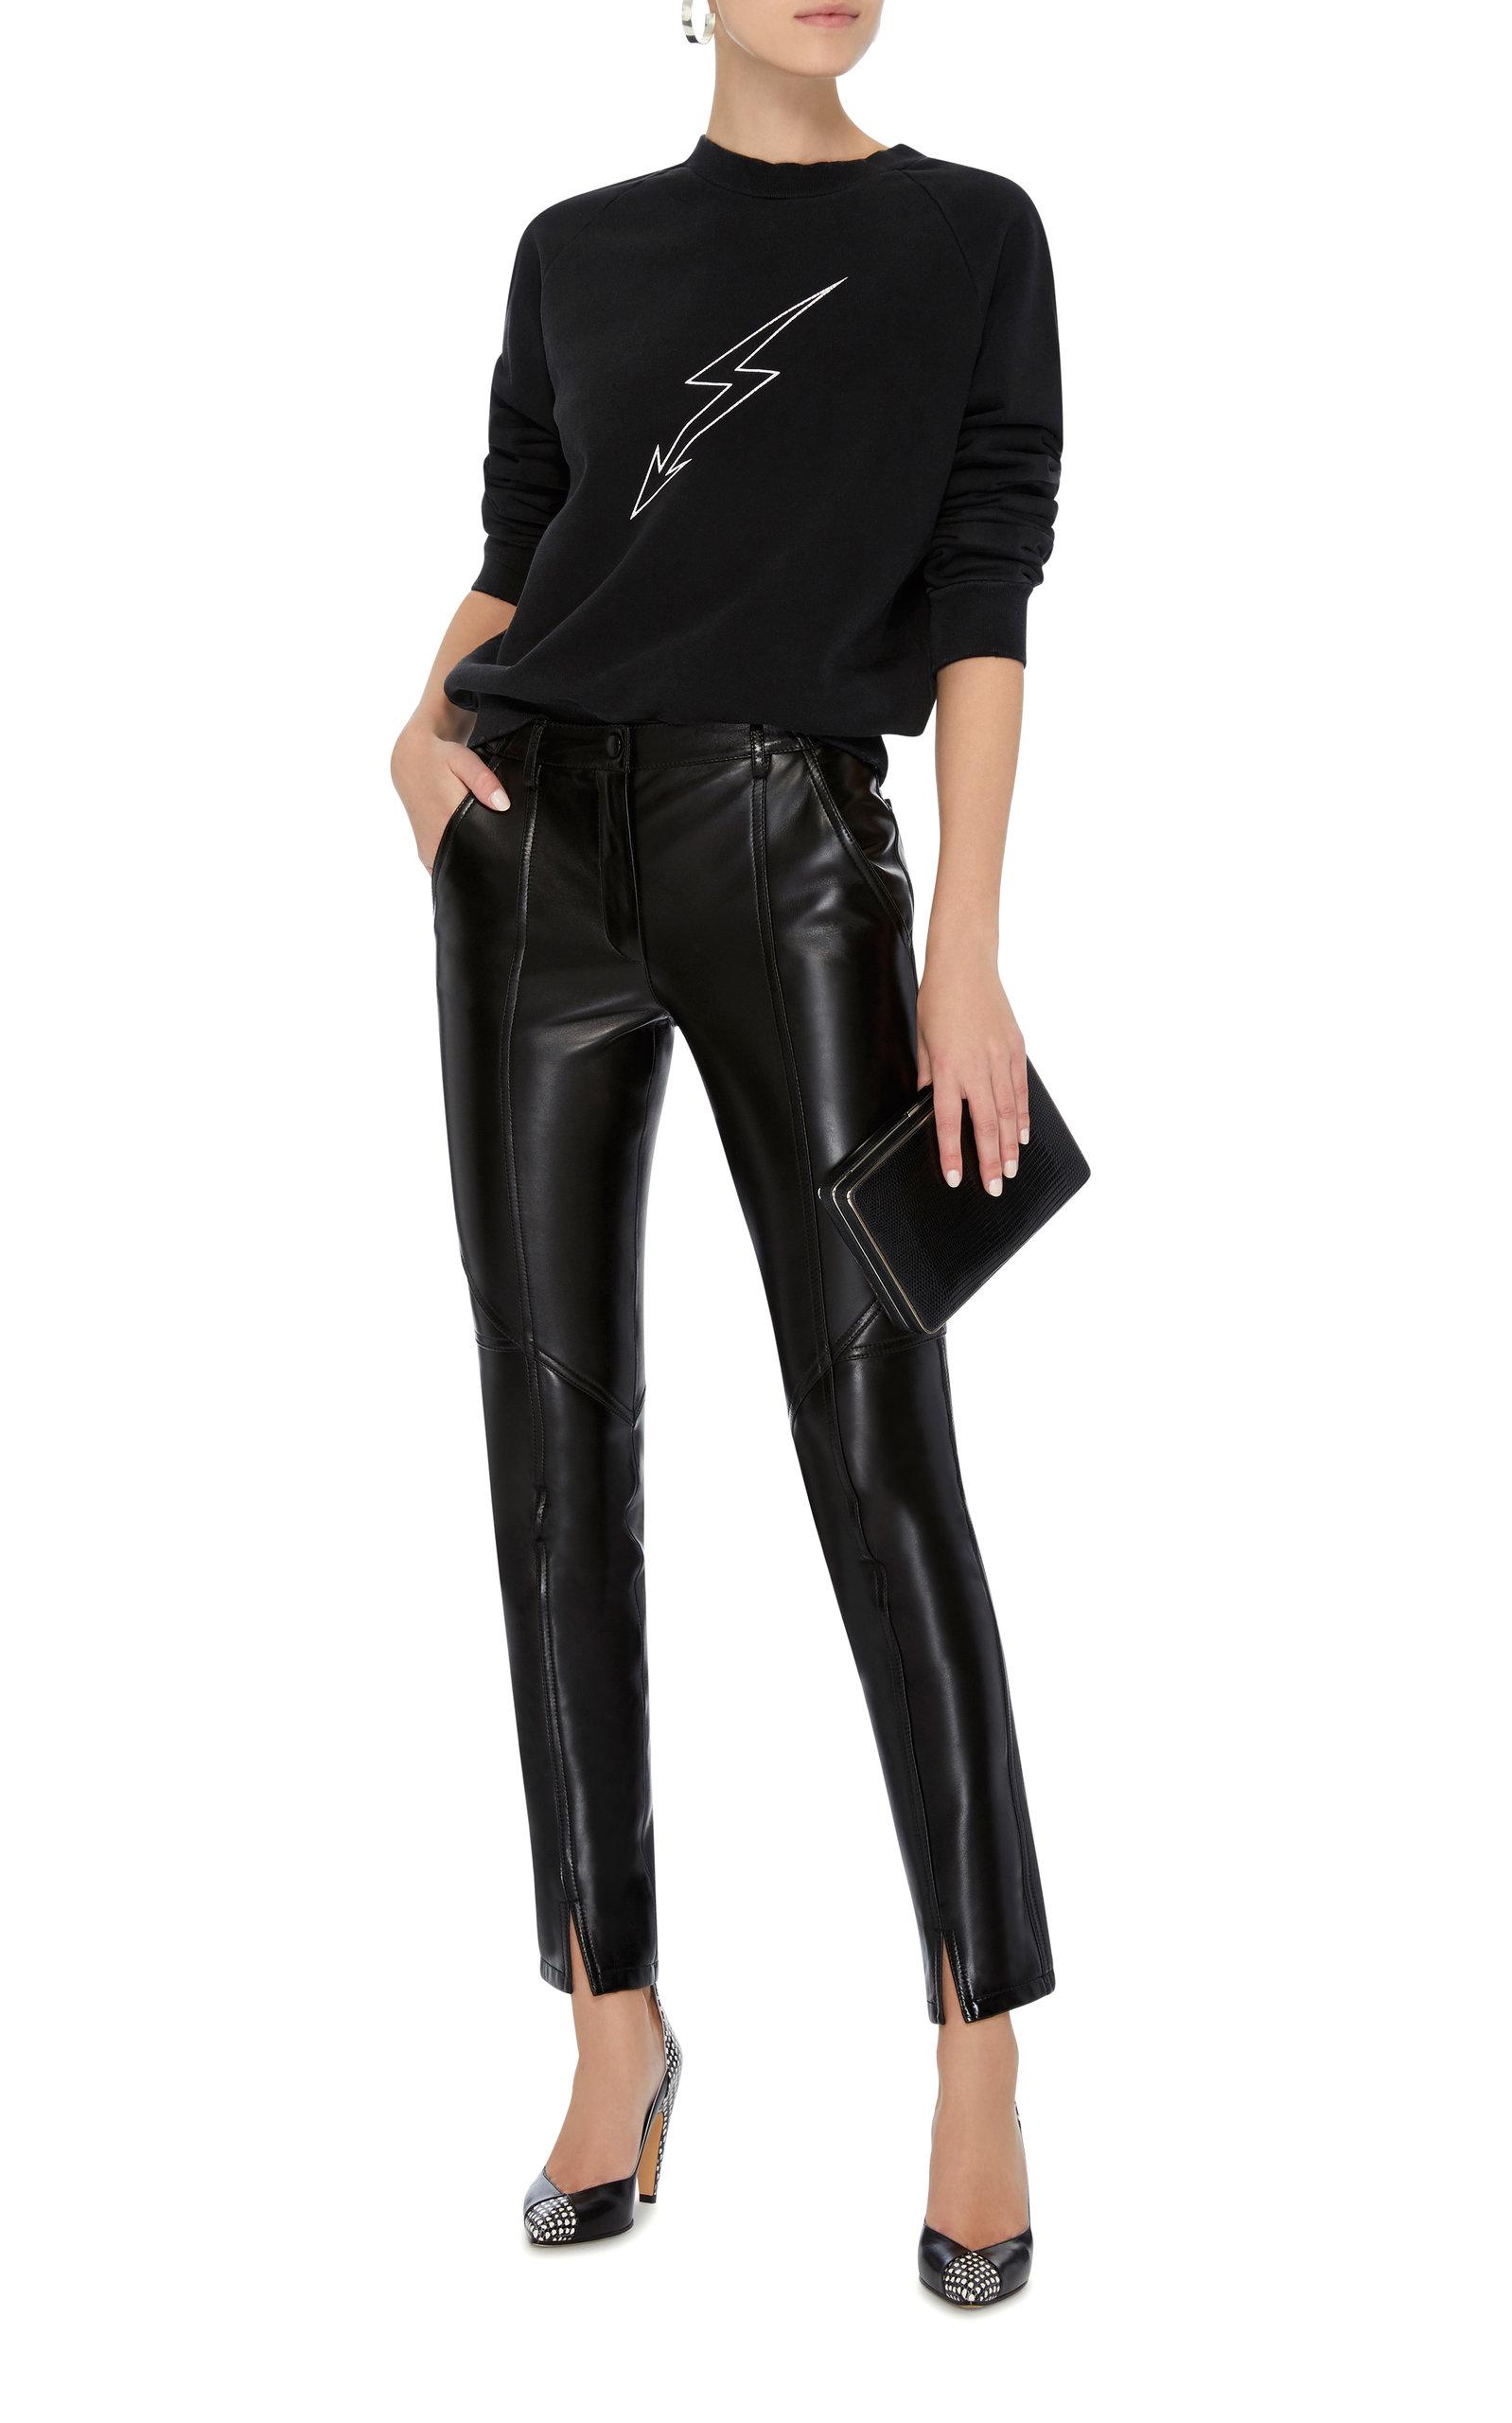 Leather Paneled By Givenchy Operandi Moda Pumps vwzrFqdw